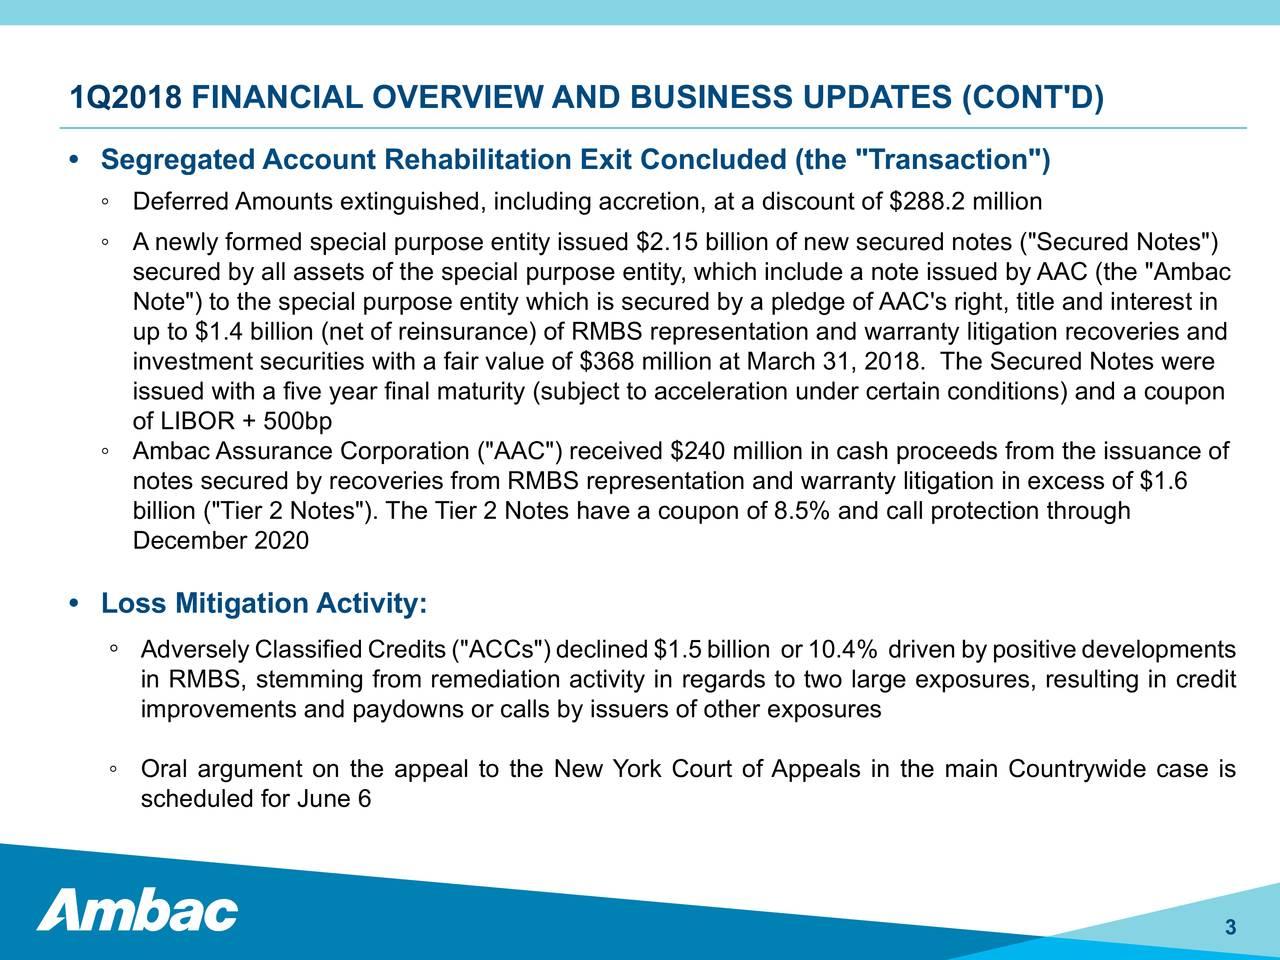 Ambac (AMBC) Announces Quarterly Earnings Results